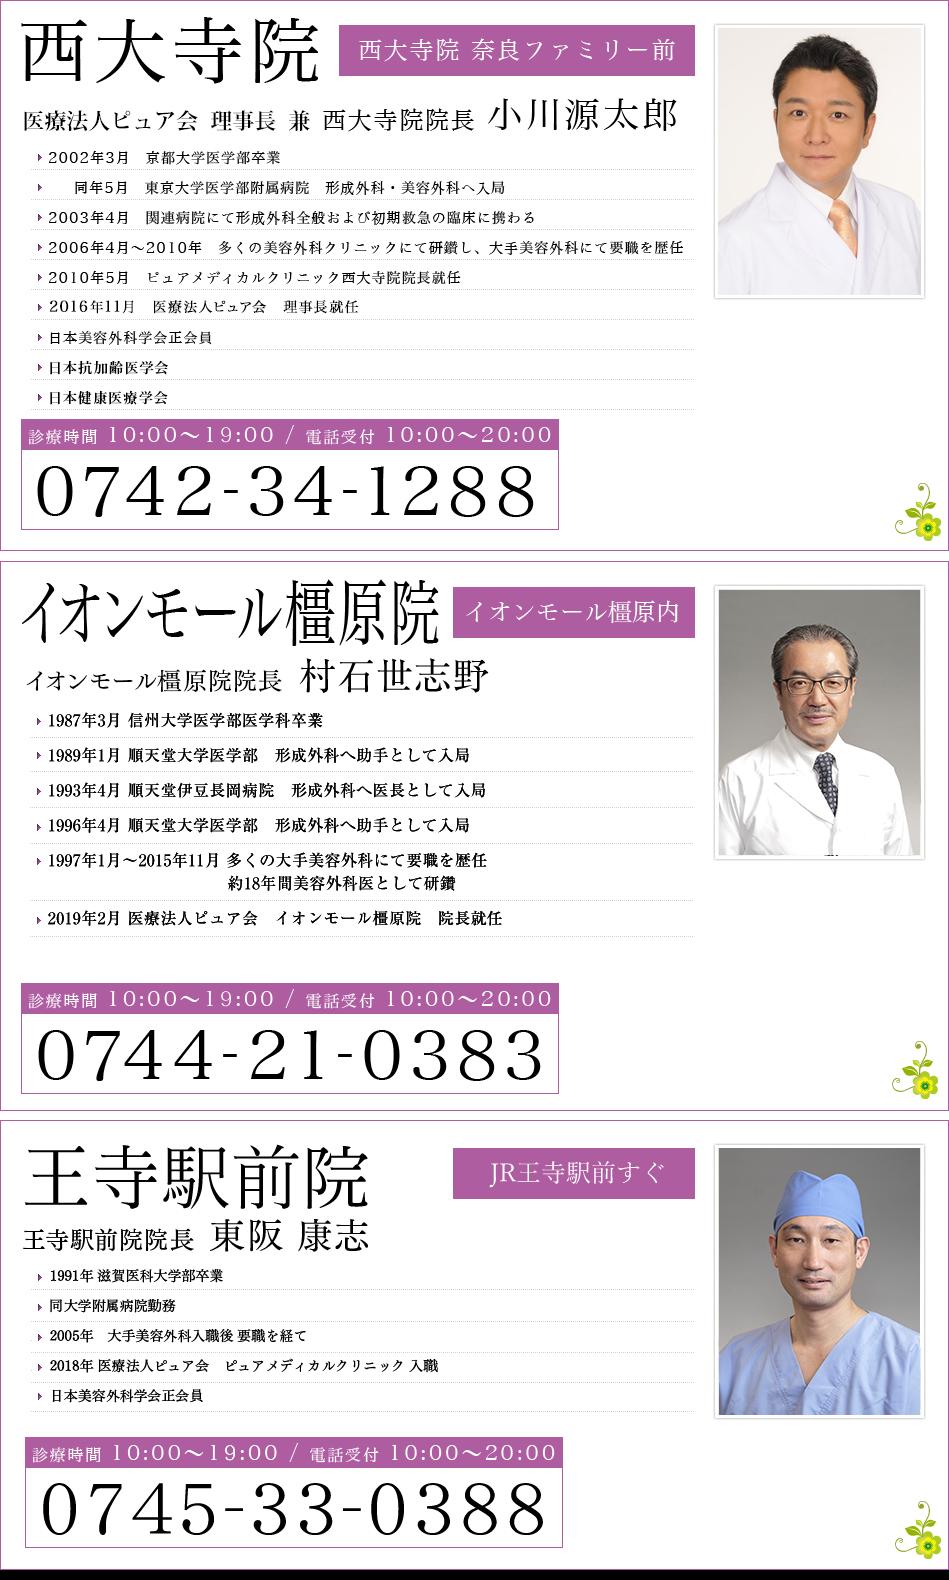 profile-information